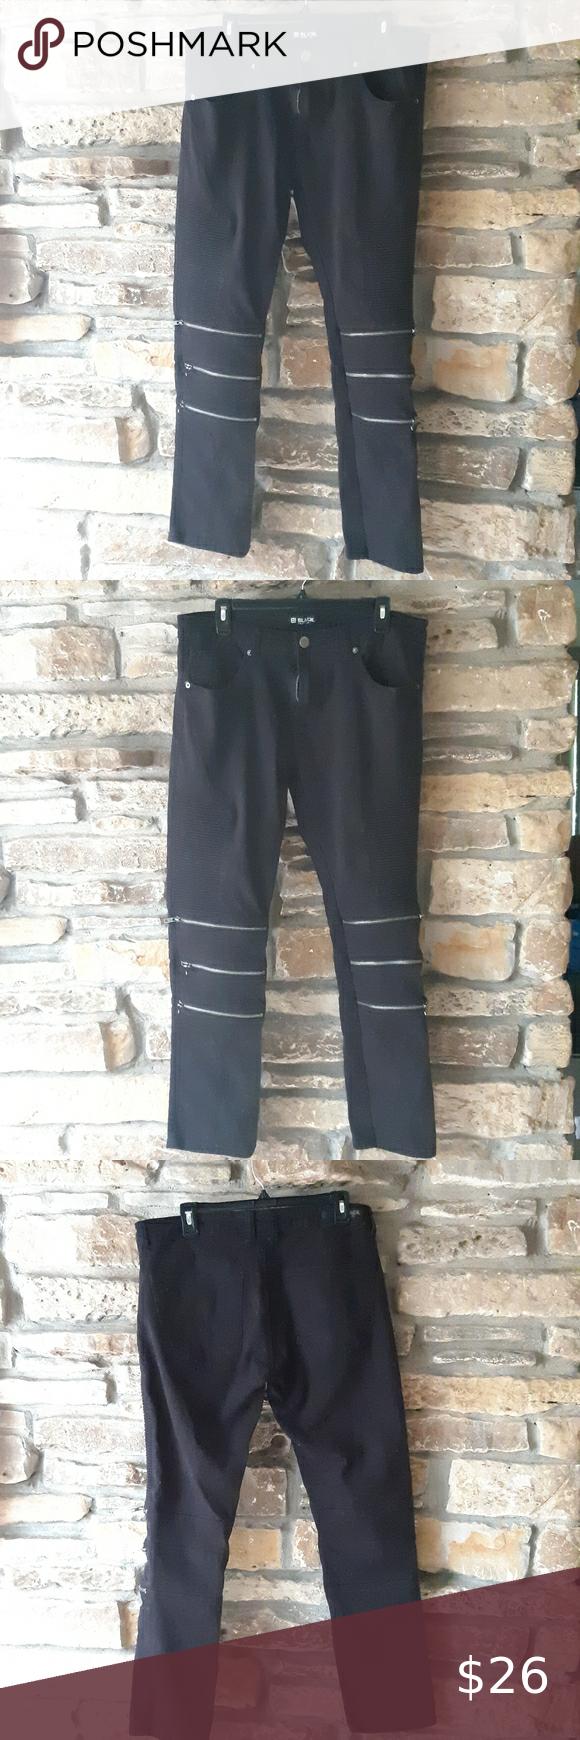 CJ Black Skinny Flex Pants